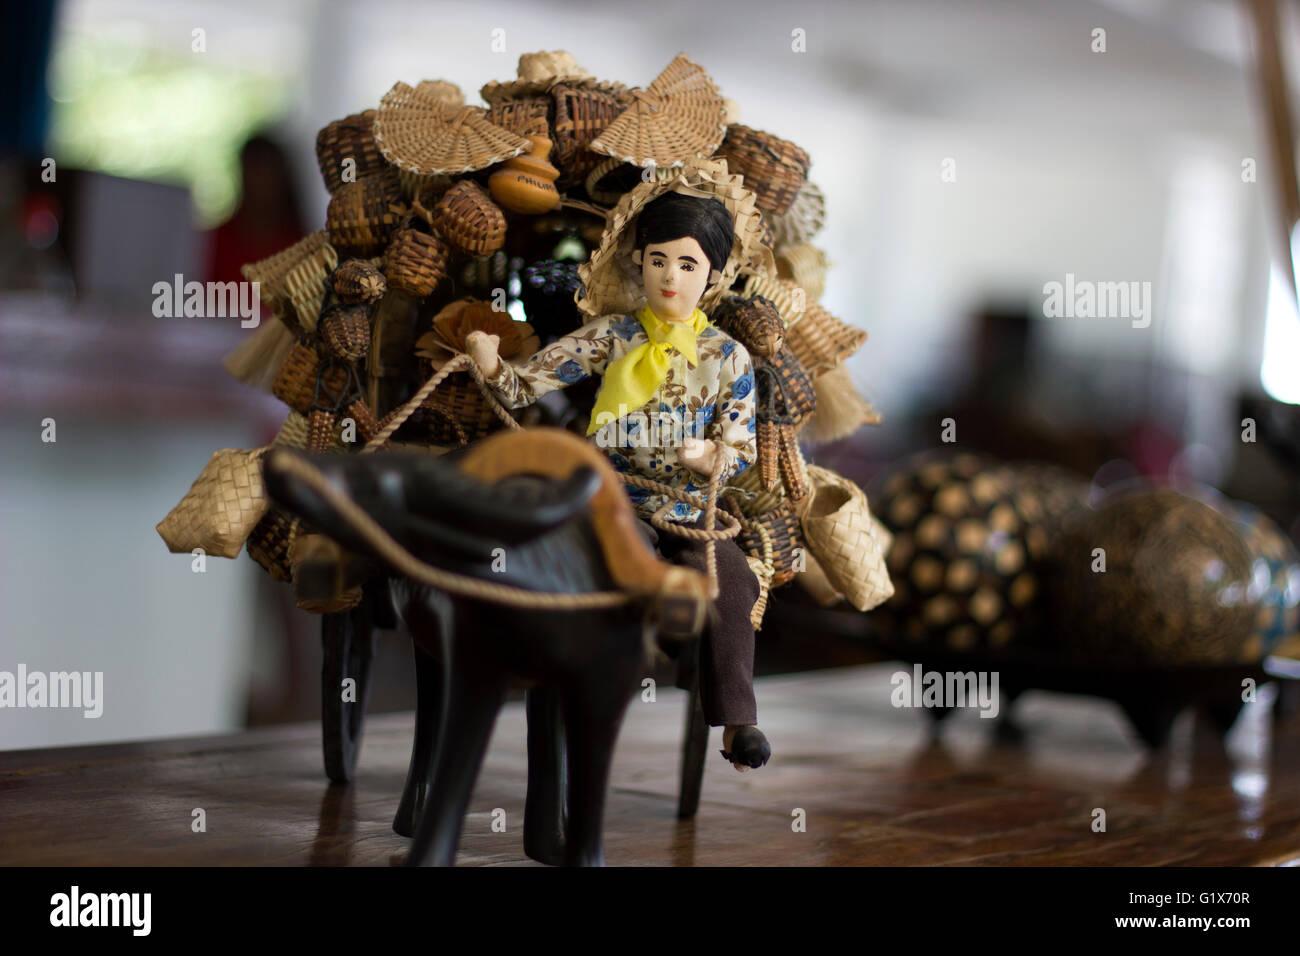 Miniature of a Filipino Farmer - Stock Image